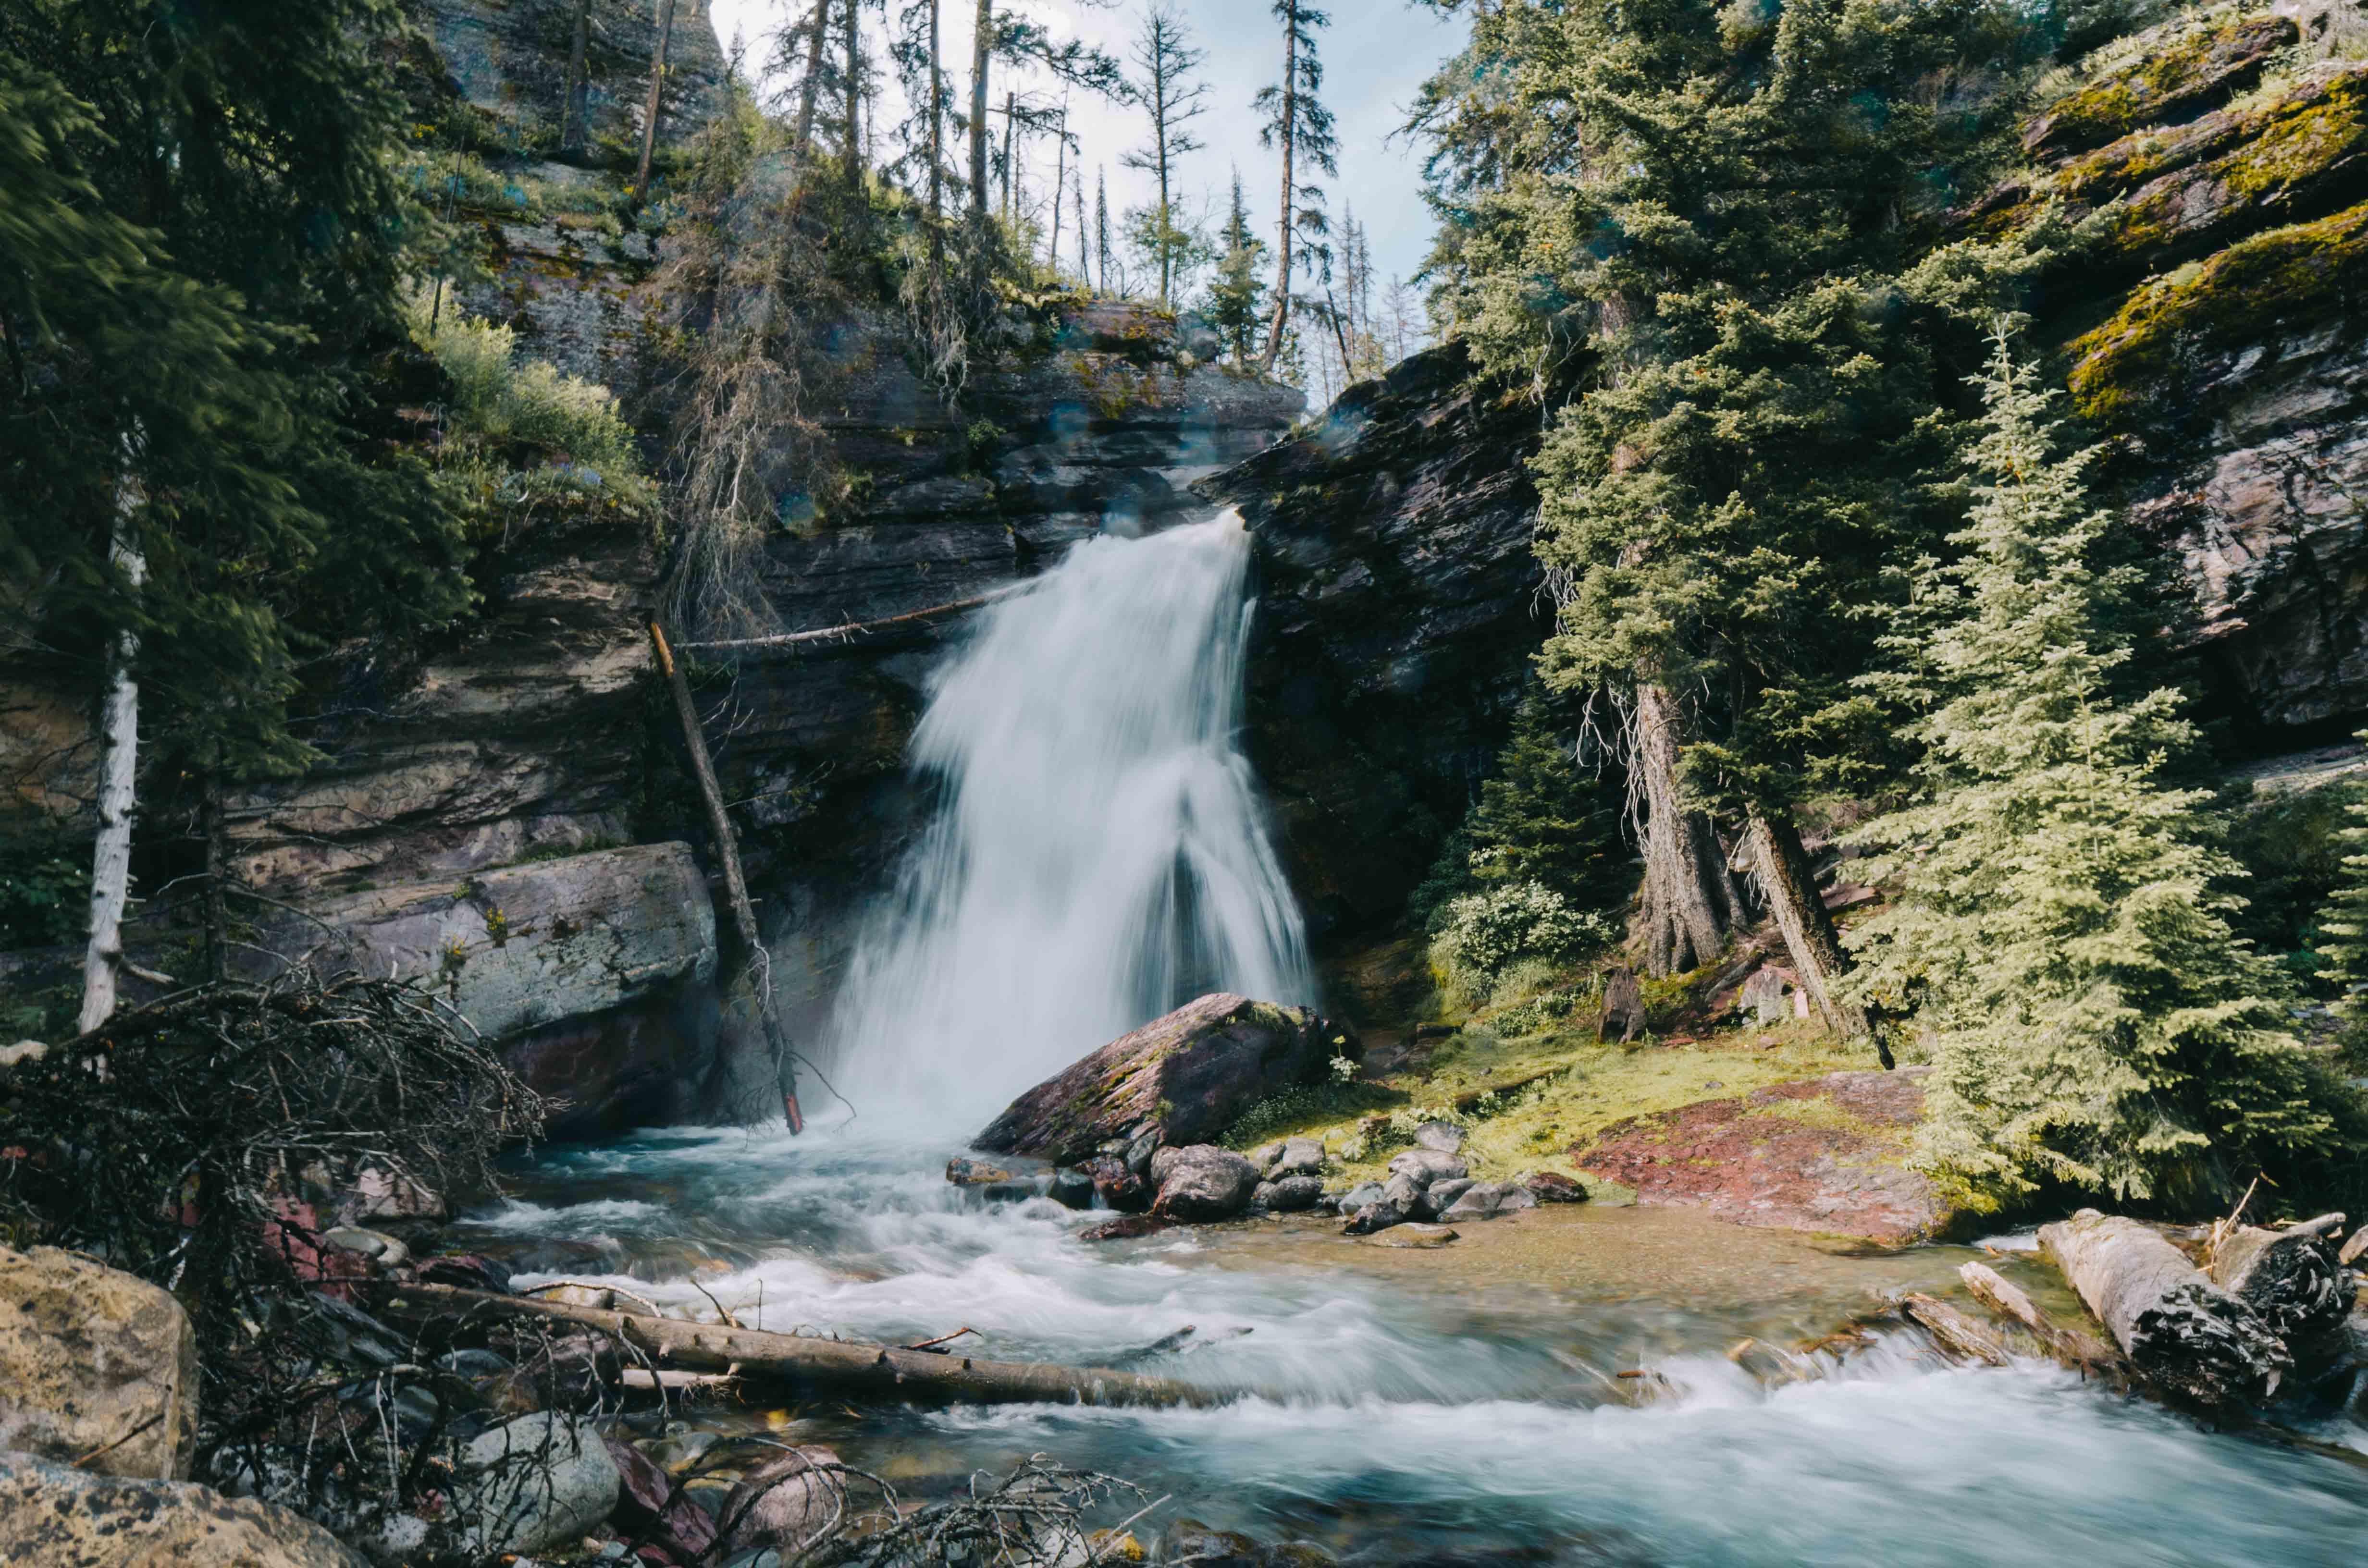 waterfalls near trees under white sky